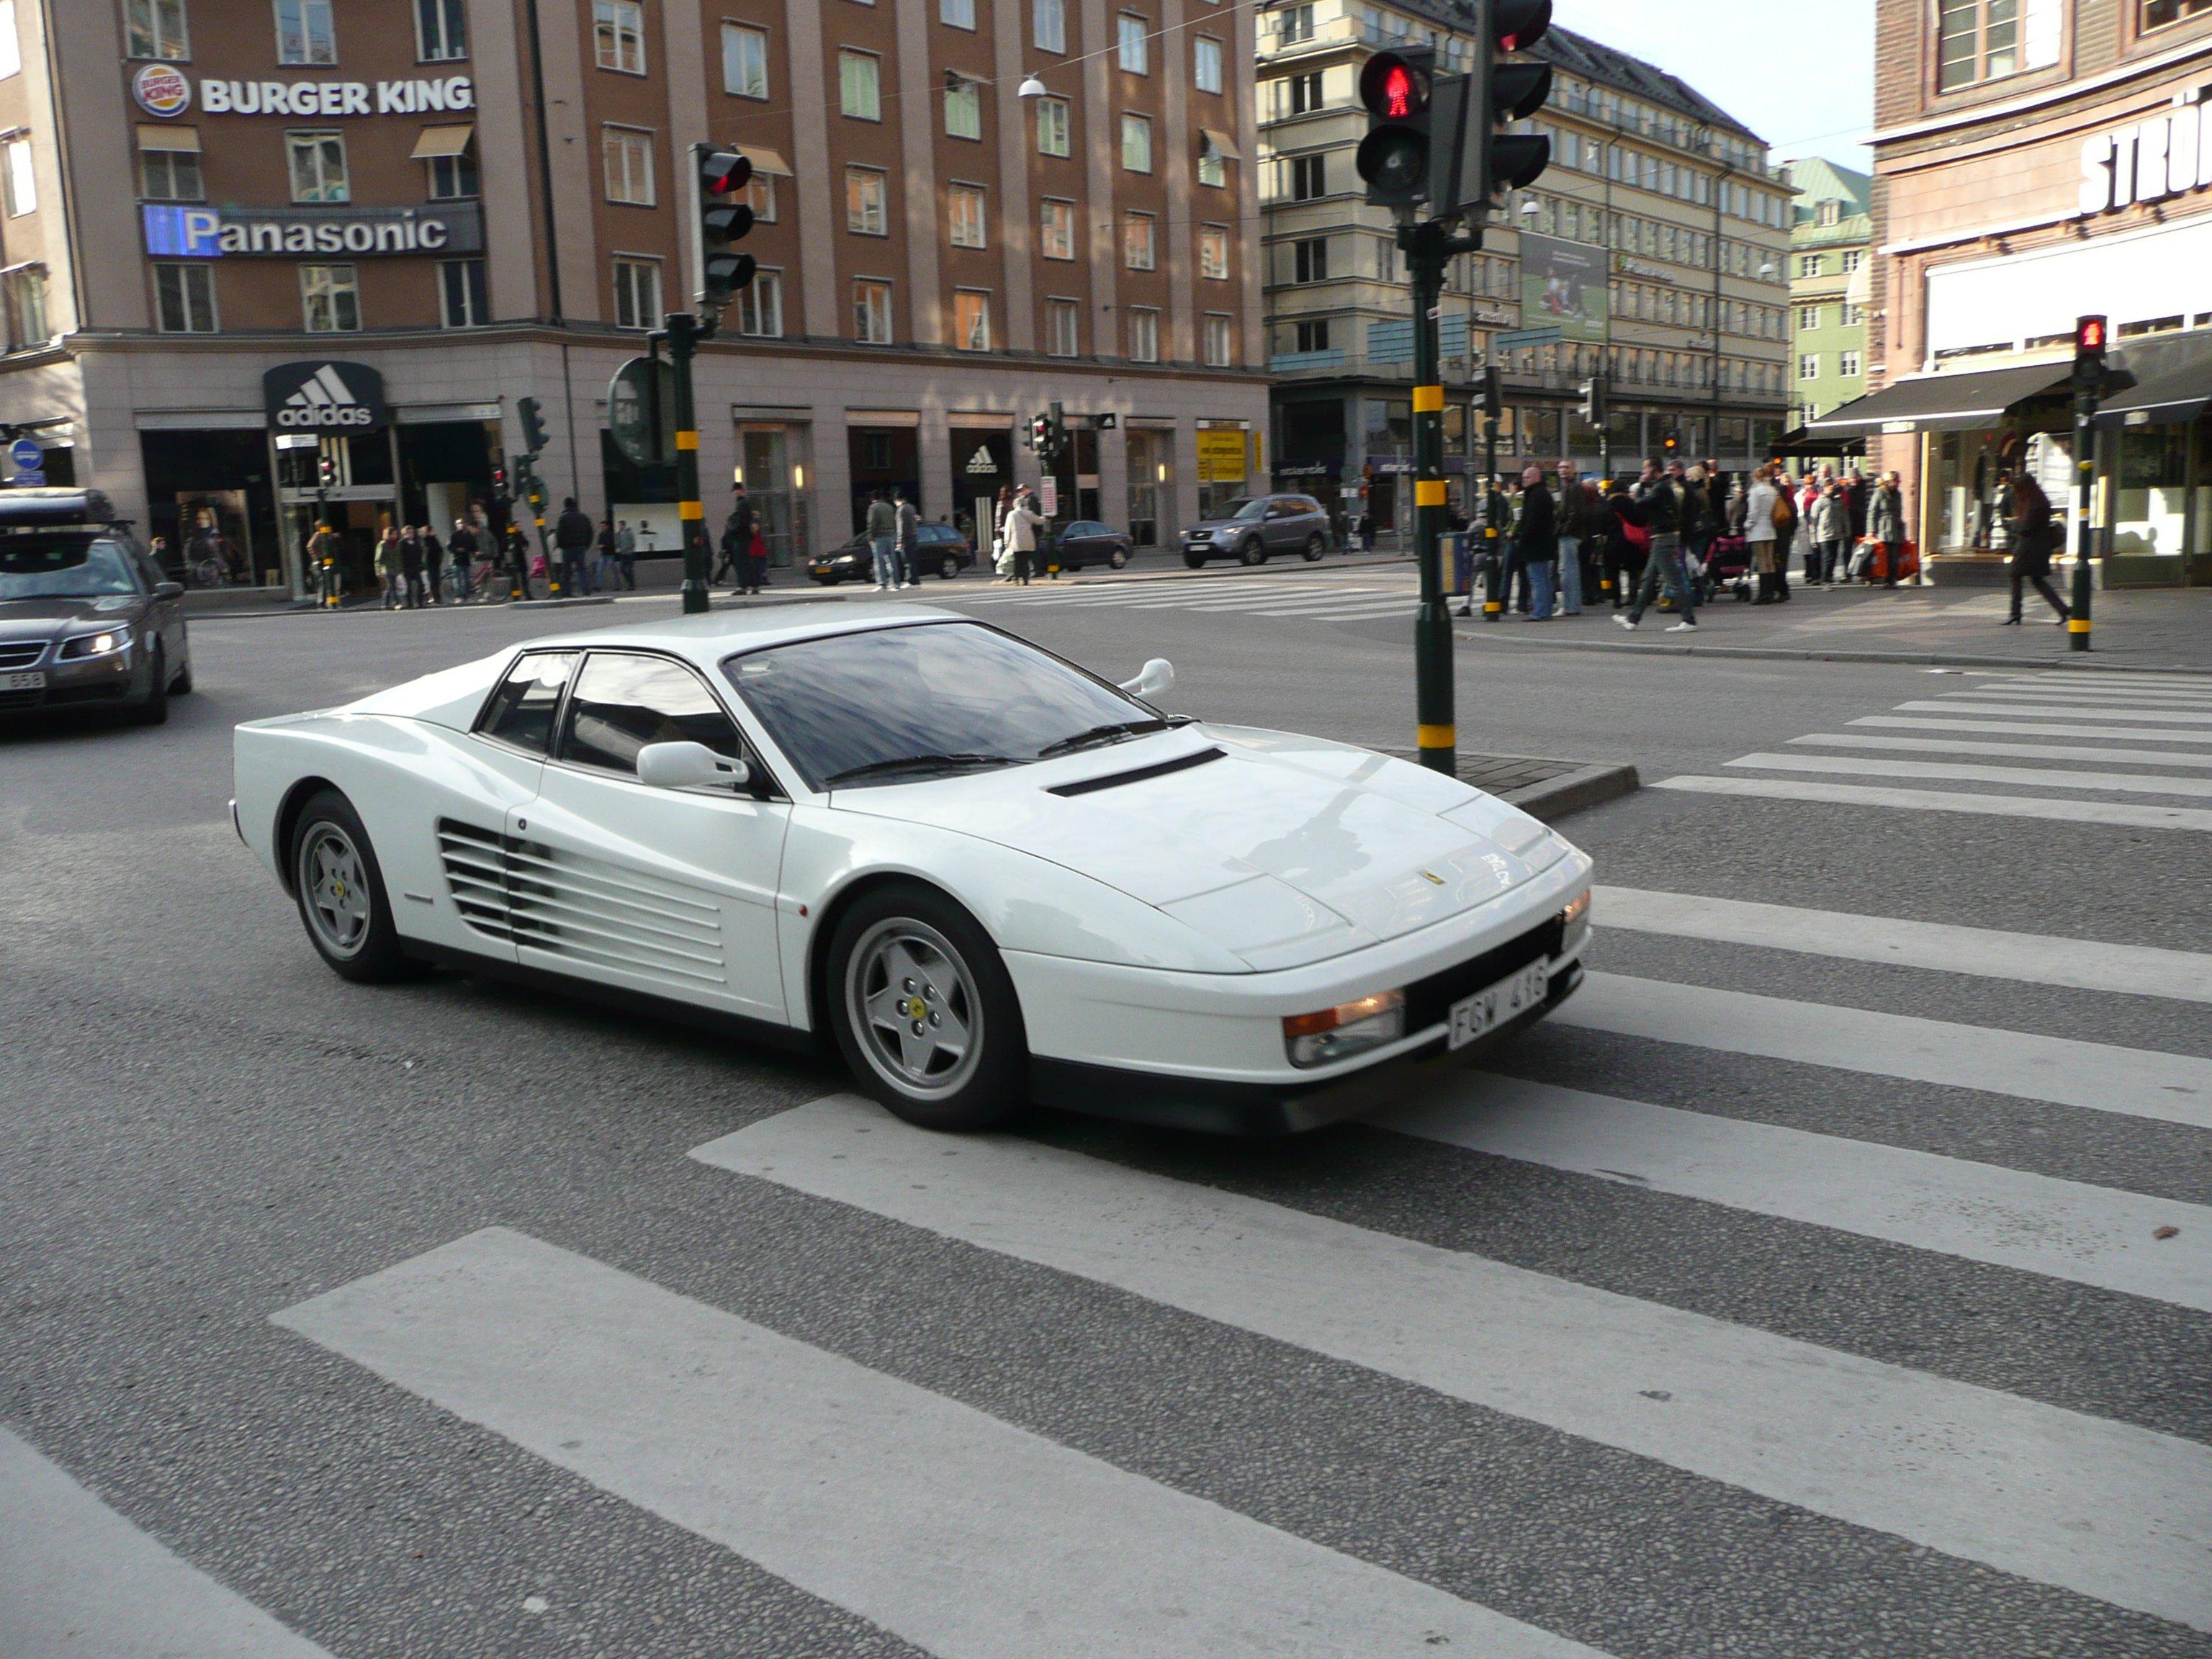 Ferrari Testarossa 512 Tr F512 M Supercars Cars Italia White Blanc Wallpaper    3072x2304   554764   WallpaperUP